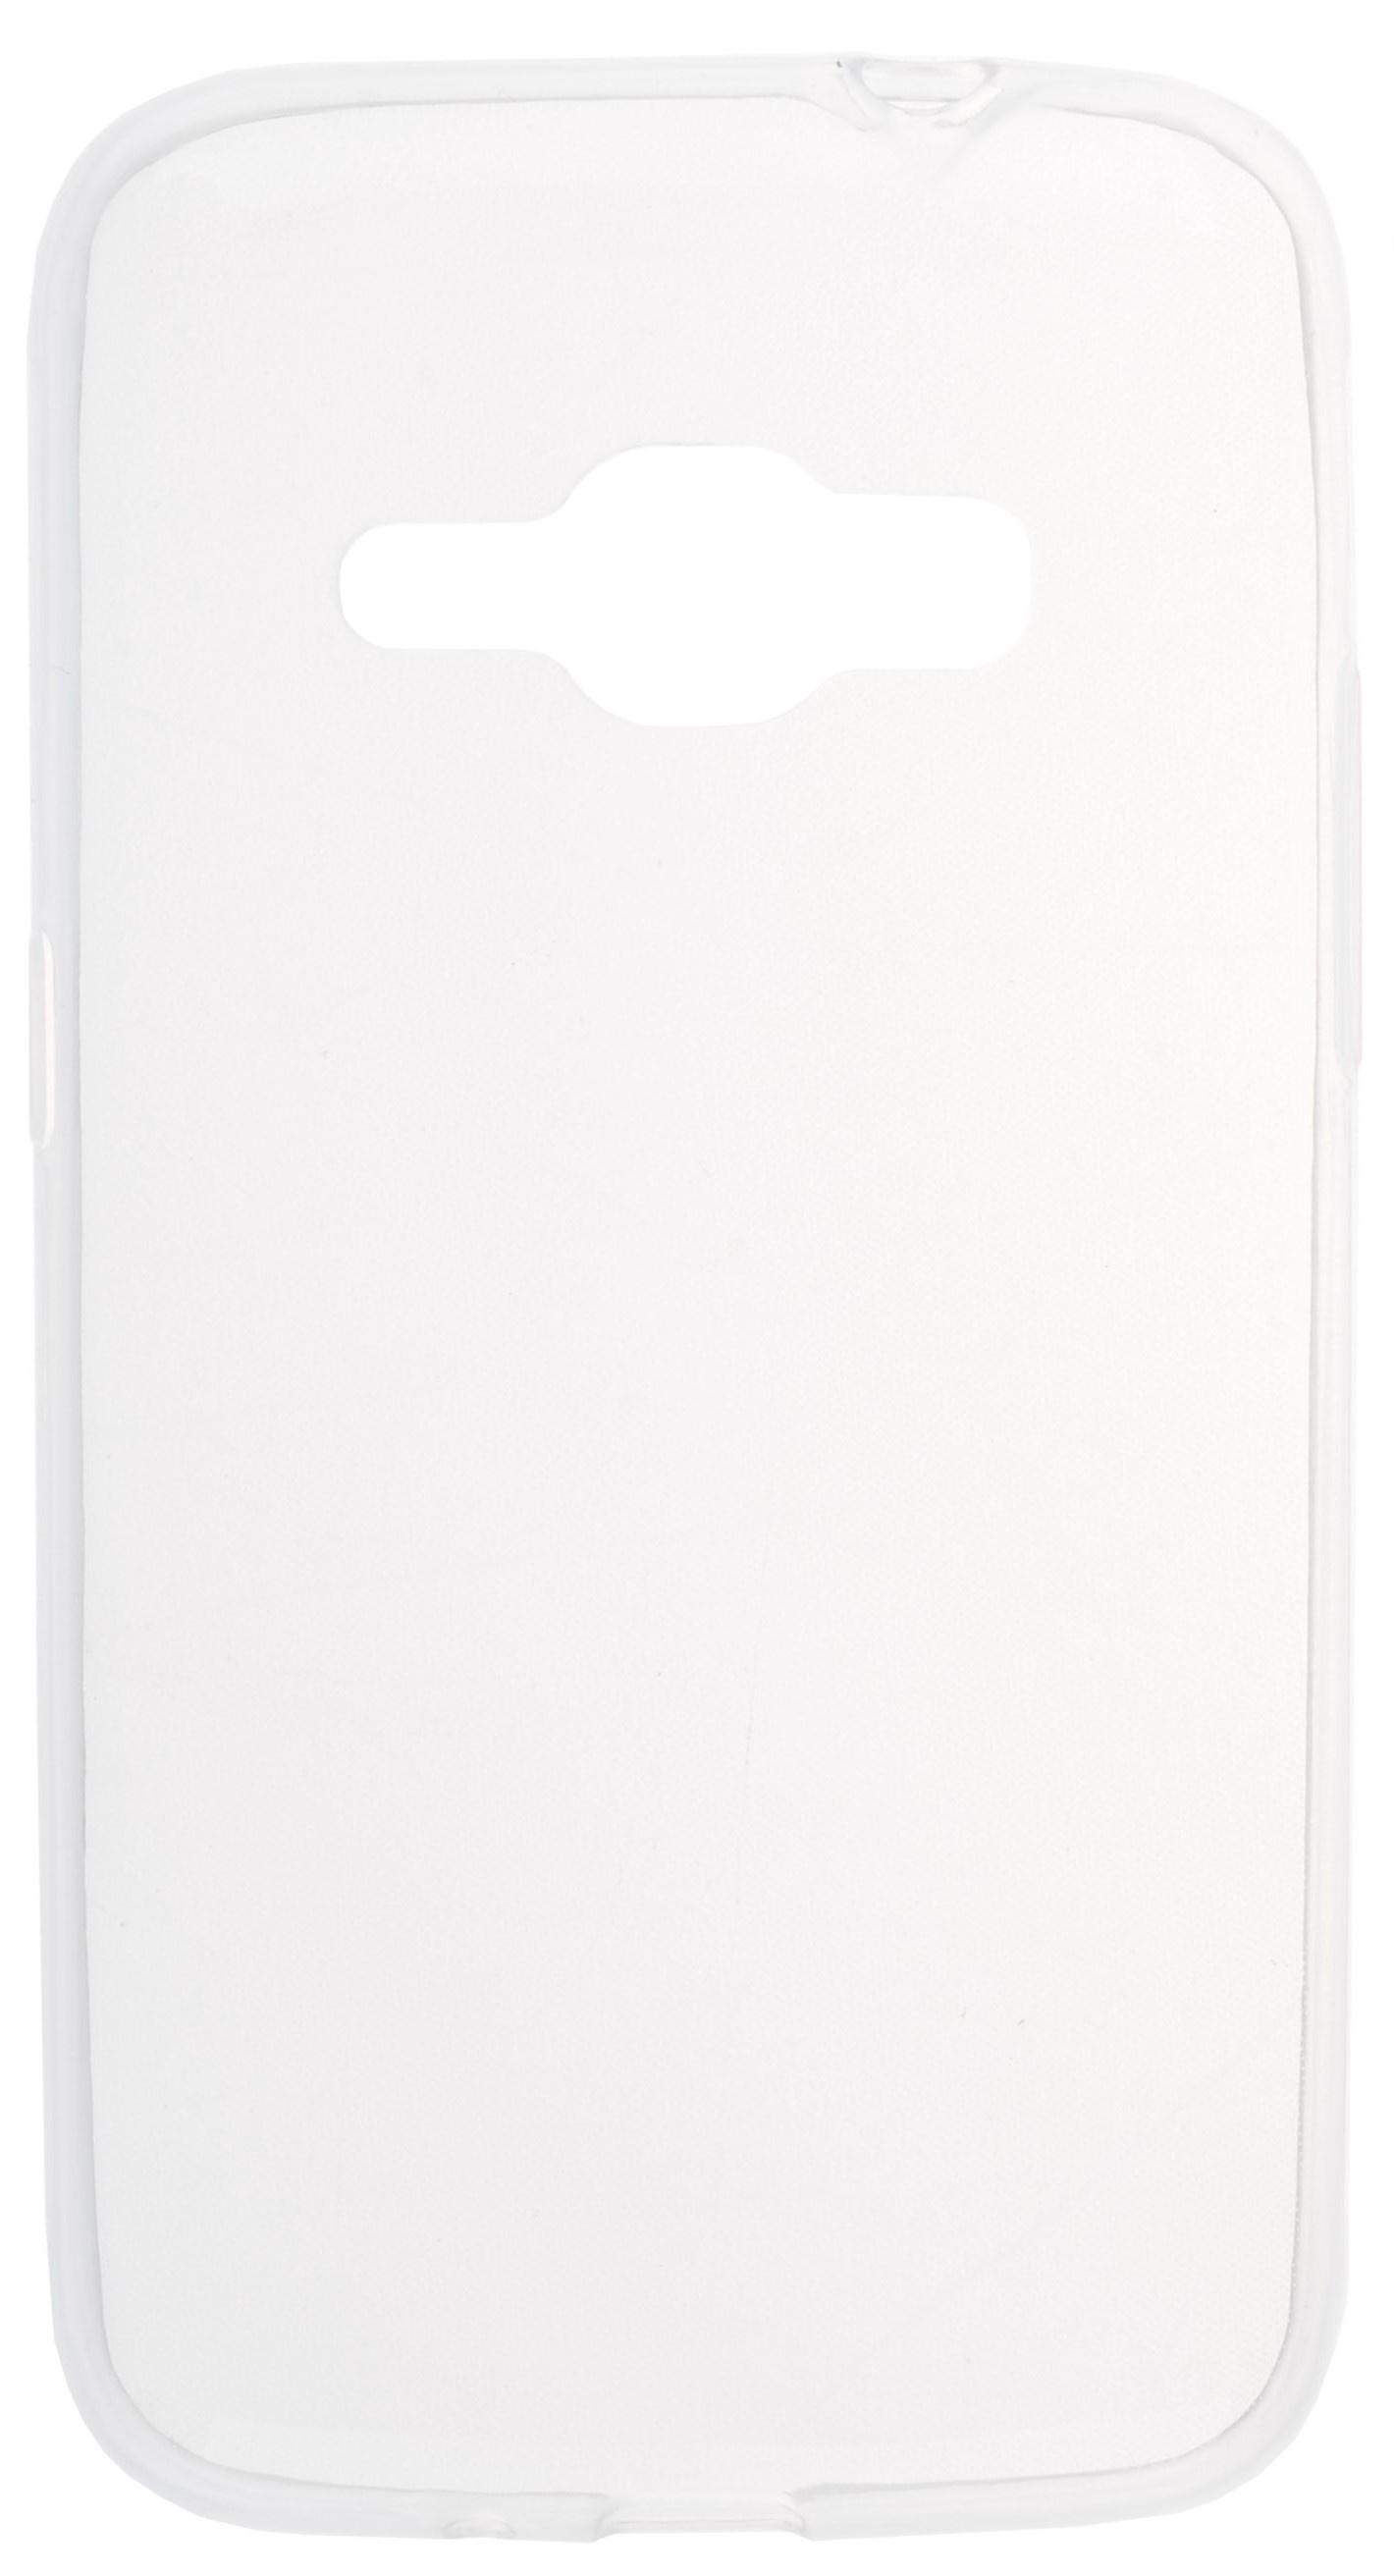 Накладка Skinbox Slim Silicone для Samsung Galaxy J1 (2016), 2000000090788, прозрачный skinbox накладка skinbox slim silicone для samsung galaxy note 7